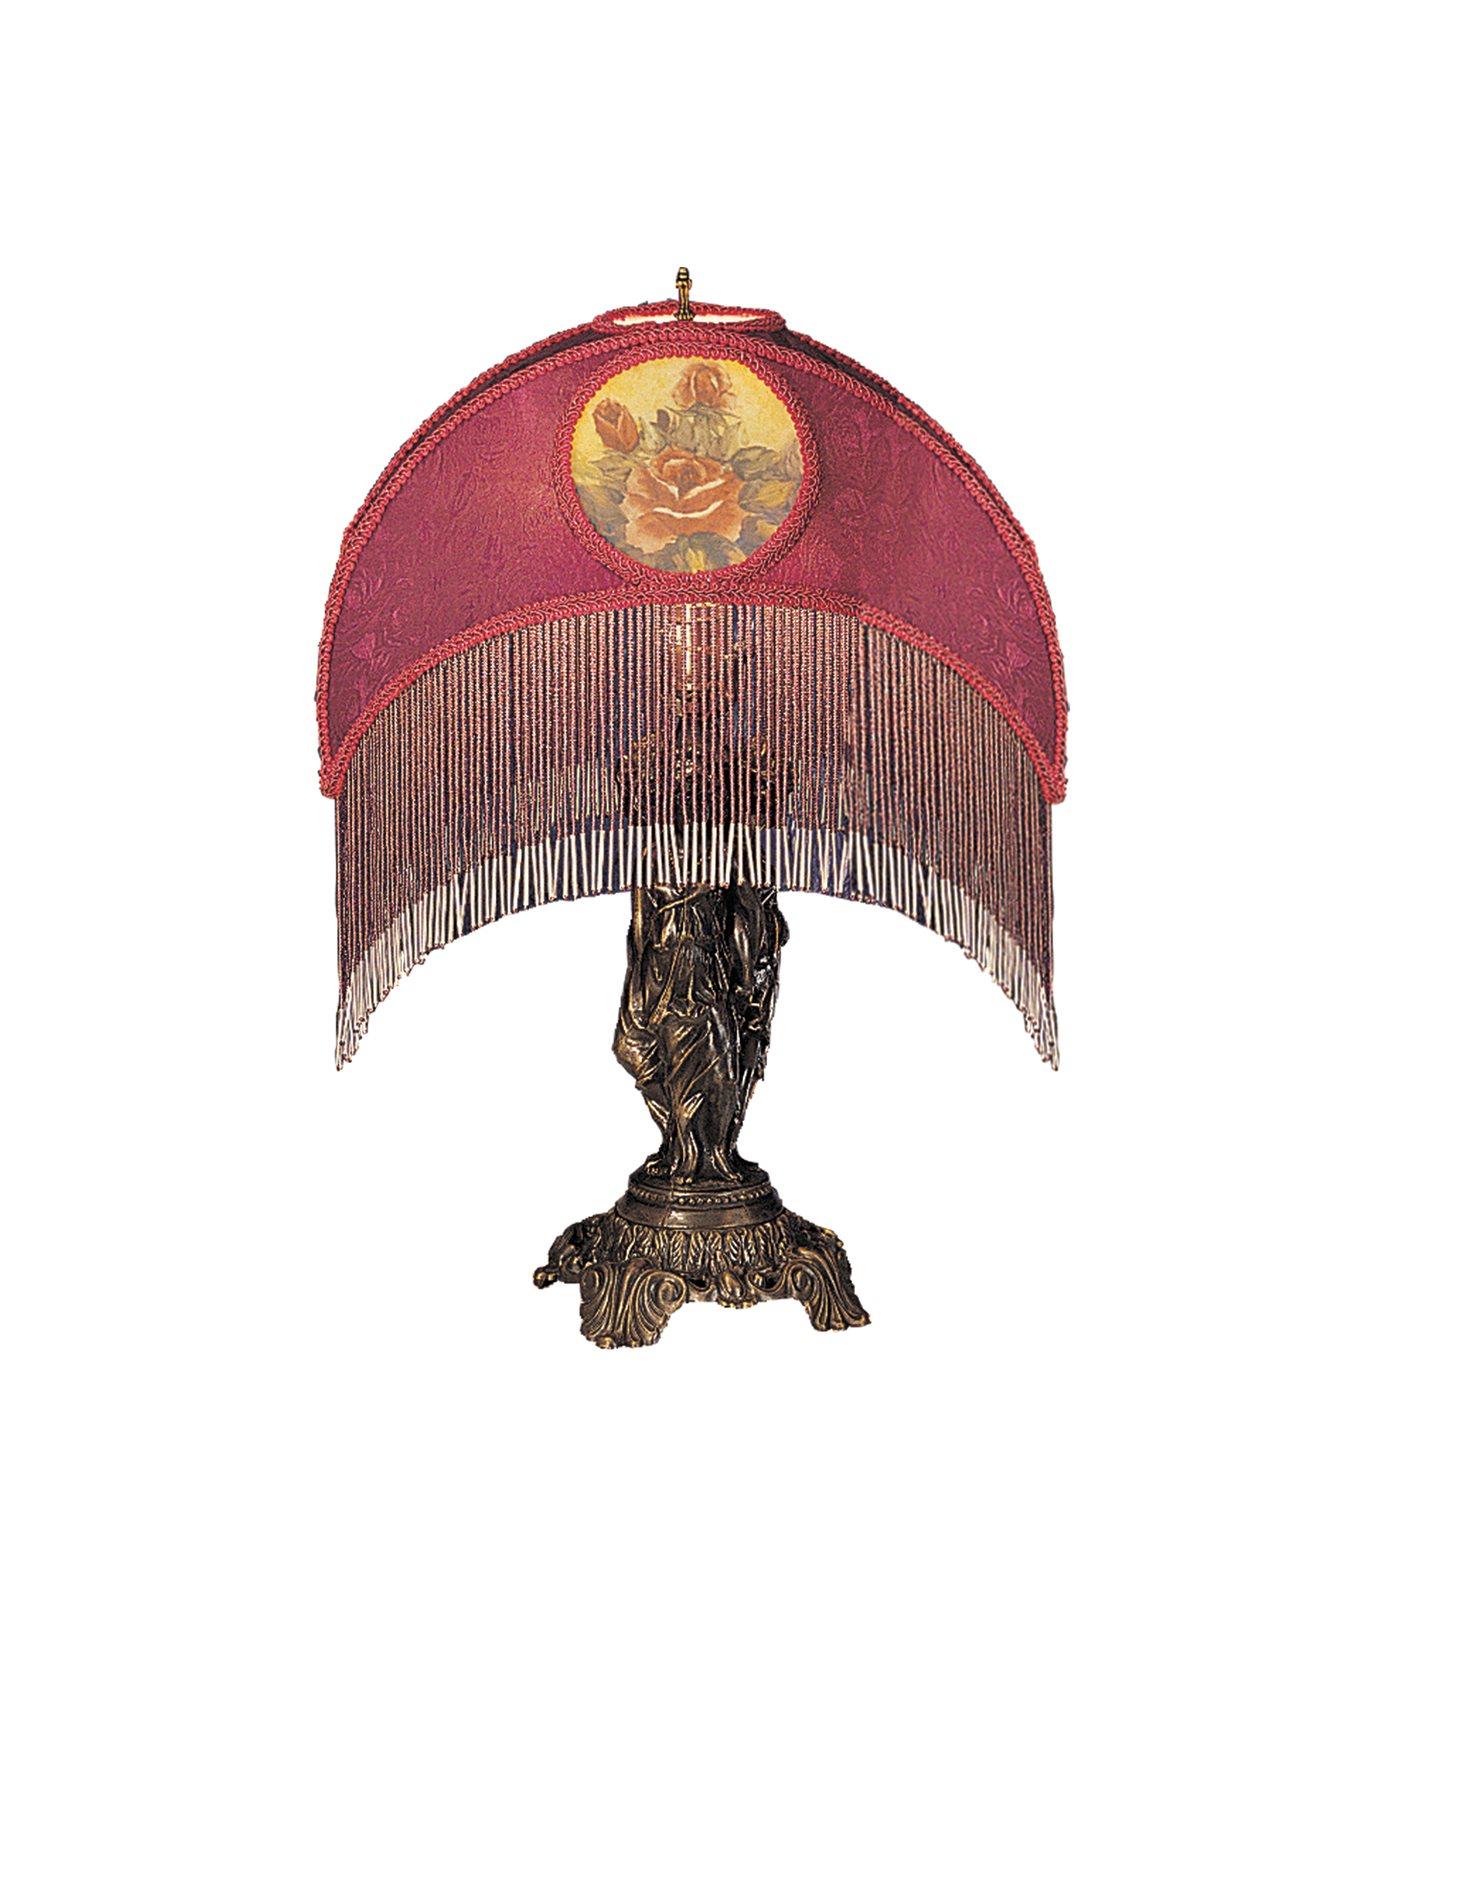 Meyda tiffany 18911 grace table lamp with purple fabric for Purple beaded lamp shade